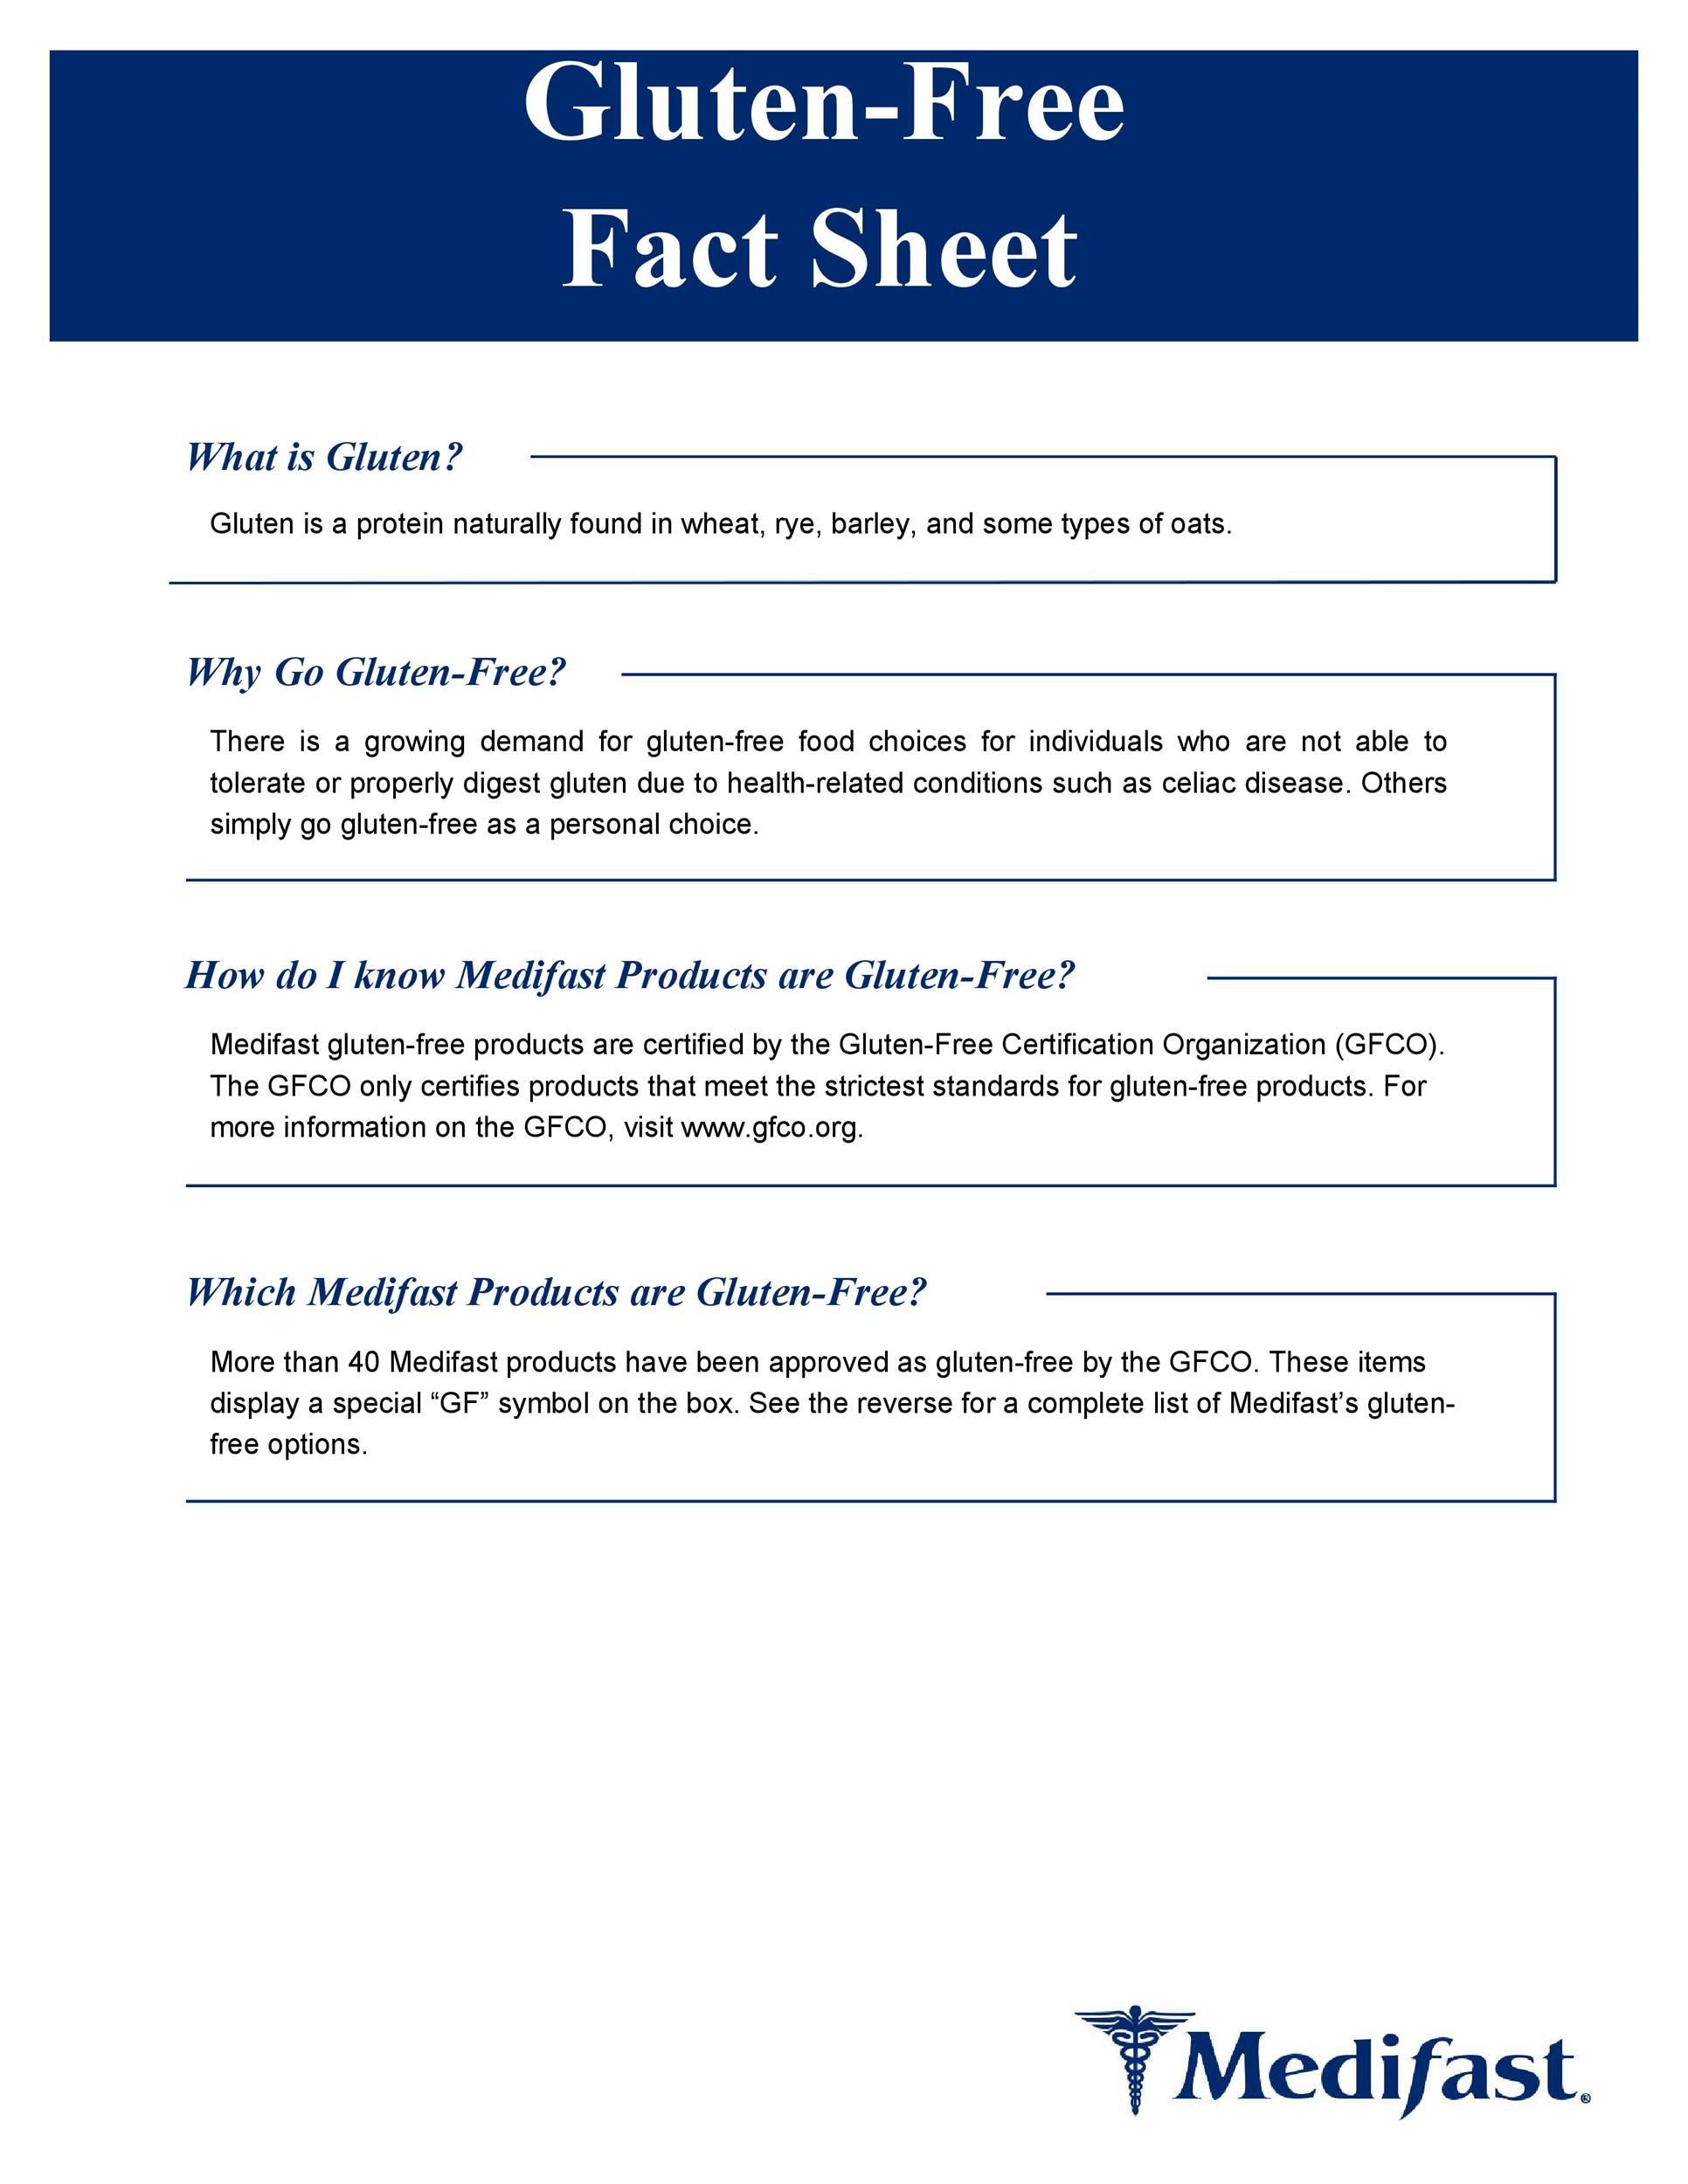 Free Fact Sheet Template 59